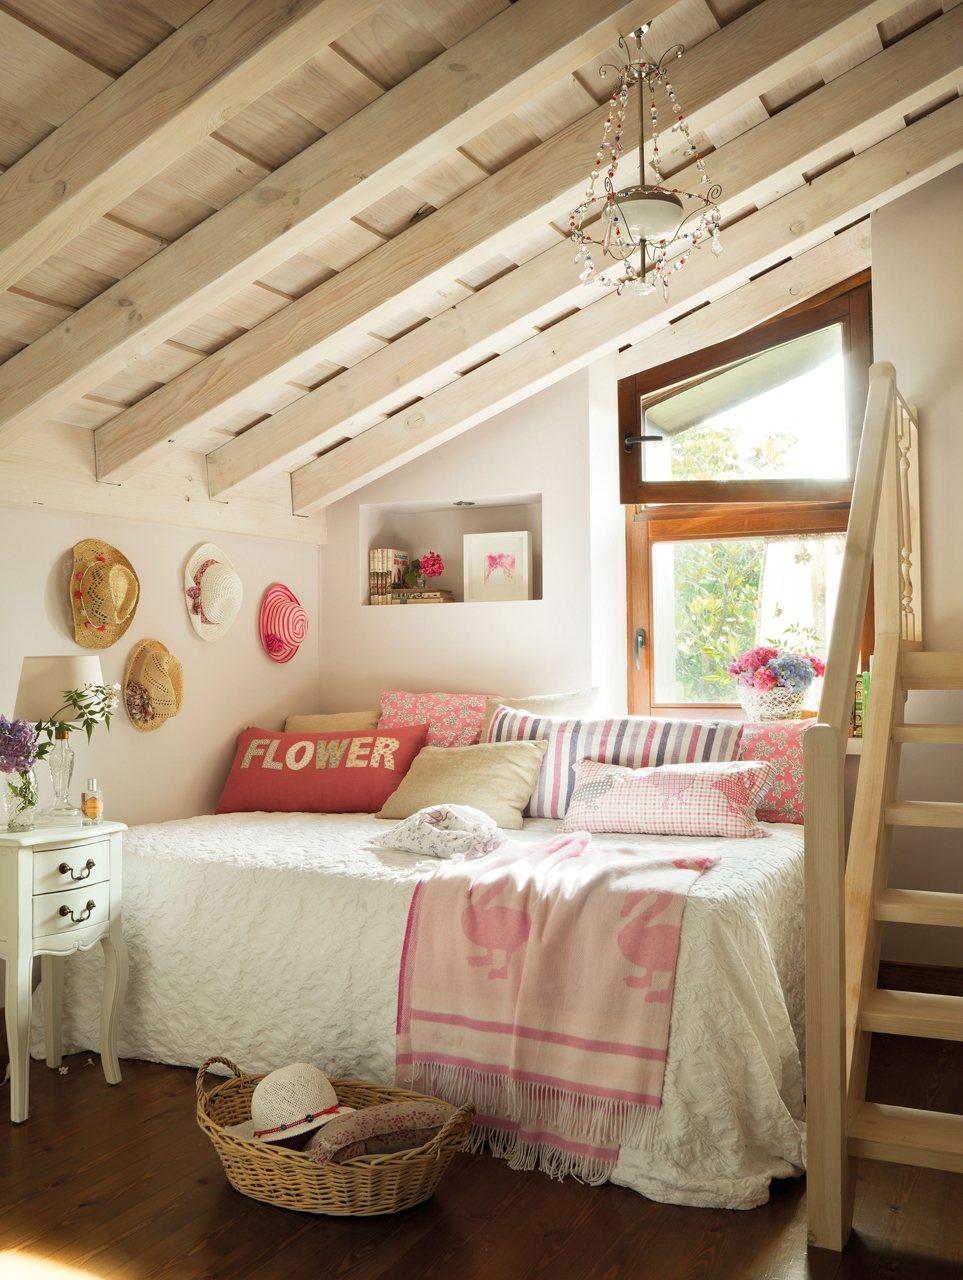 Decorar buhardillas dormitorio infantil